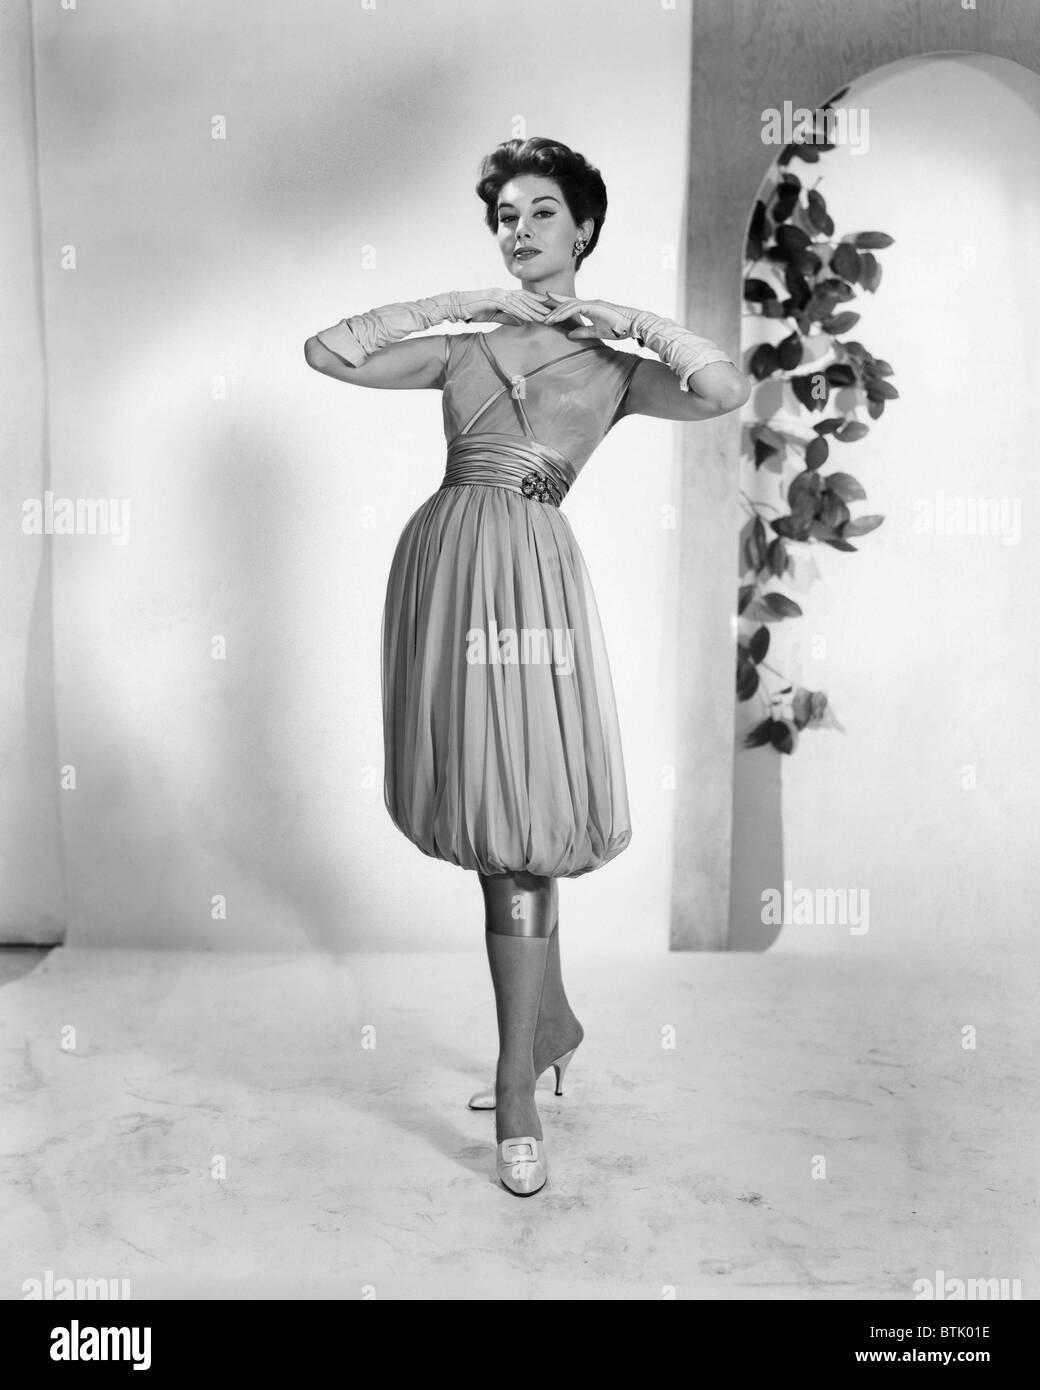 1950s Fashion Stockfotos & 1950s Fashion Bilder Alamy